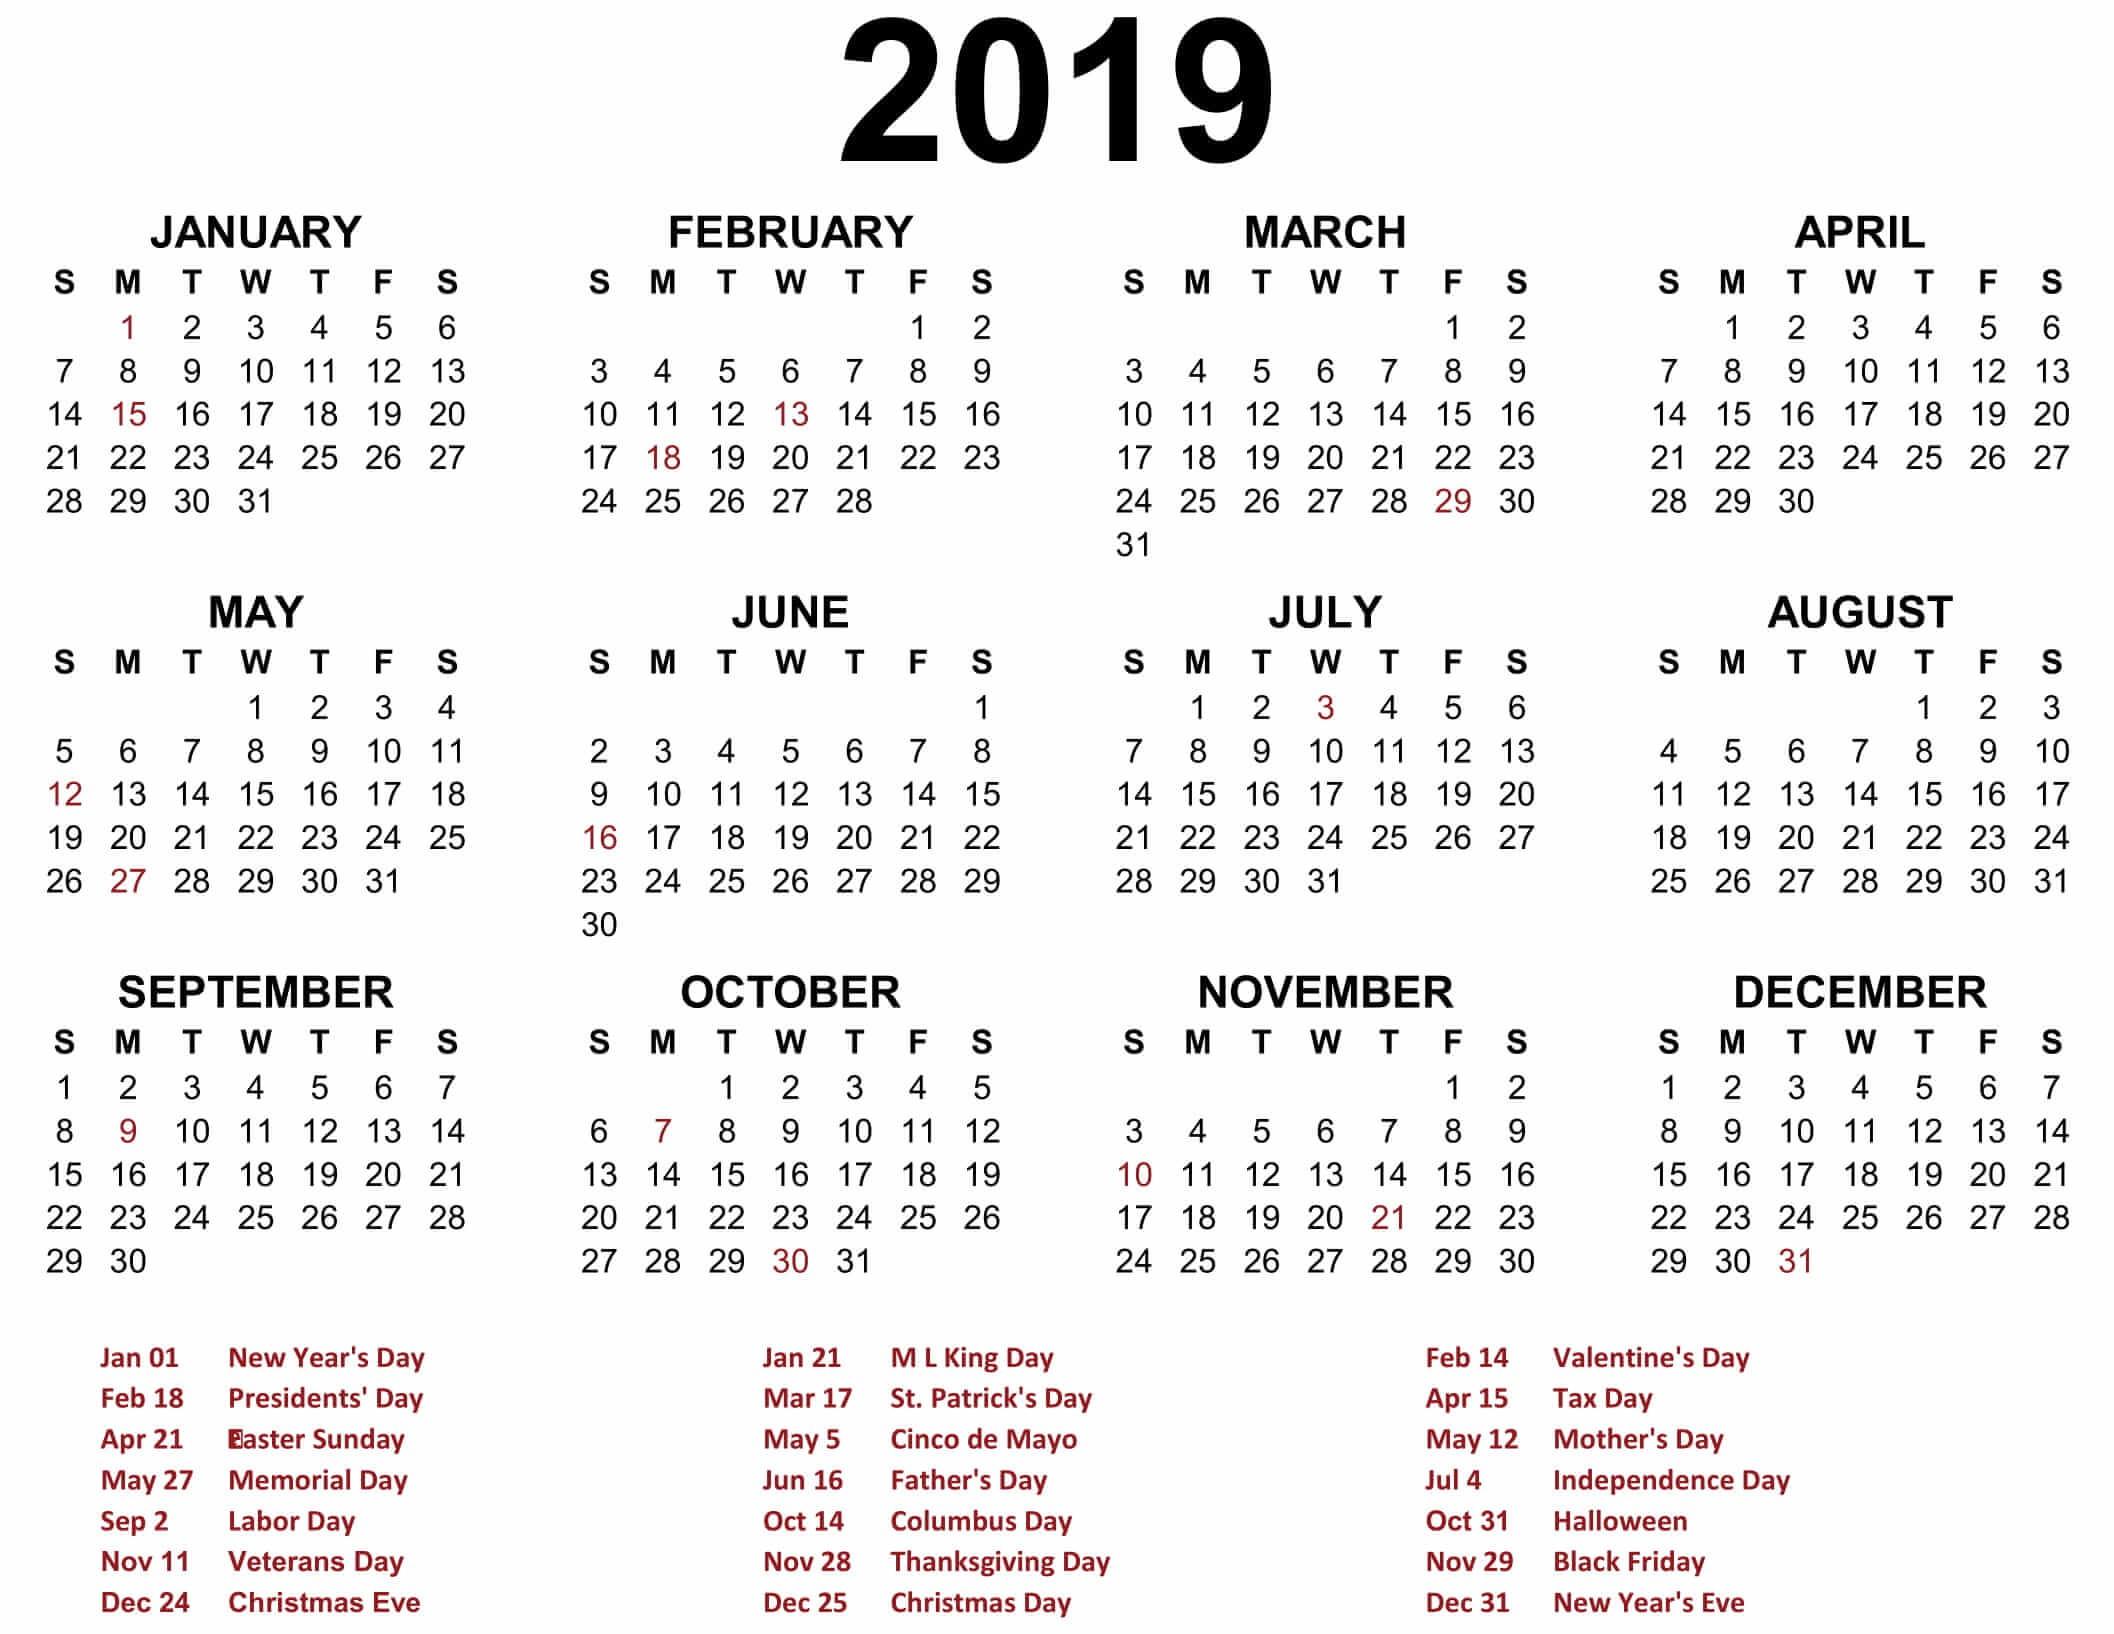 2019 Printable Calendar Yearly Printable Blank 2019 Calendar Templates Calenndar